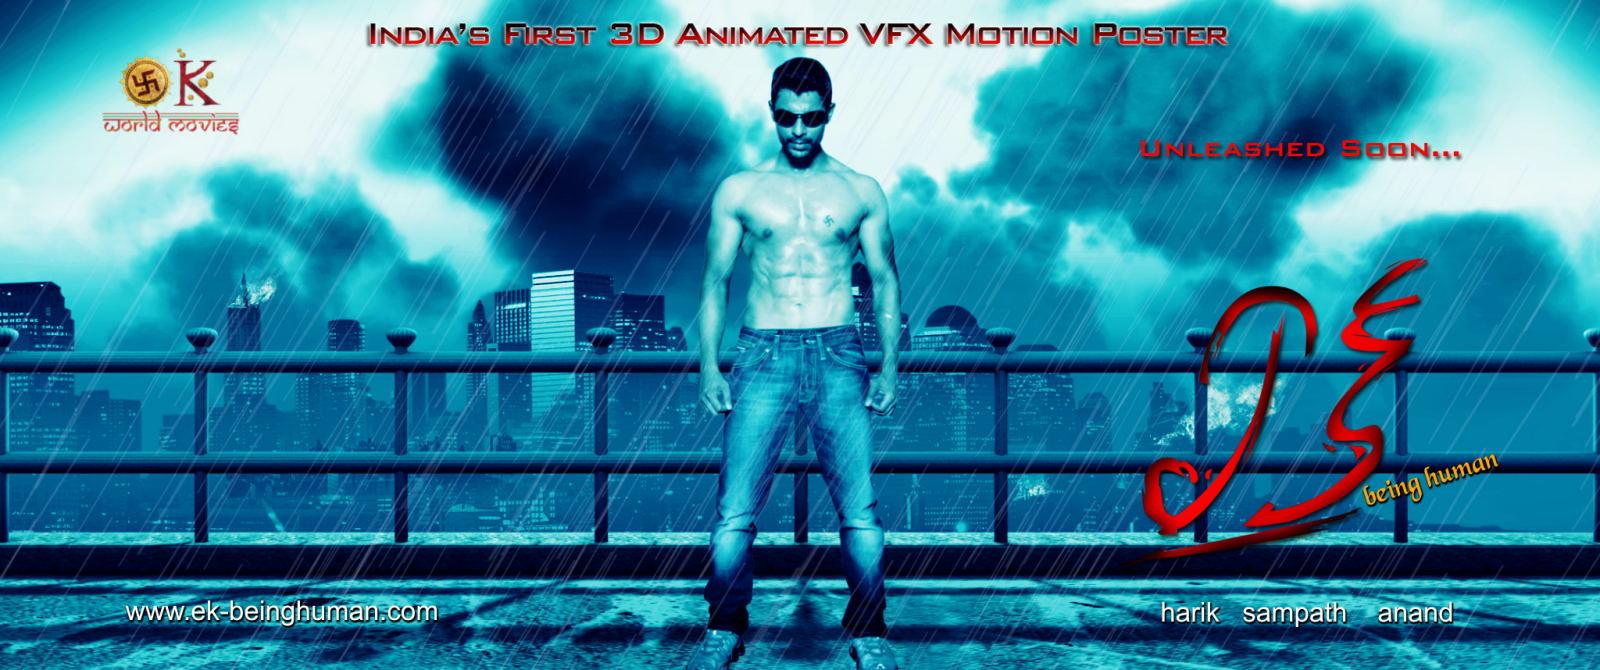 Telugu animated movies hd : Giraftar hindi movie mp3 download